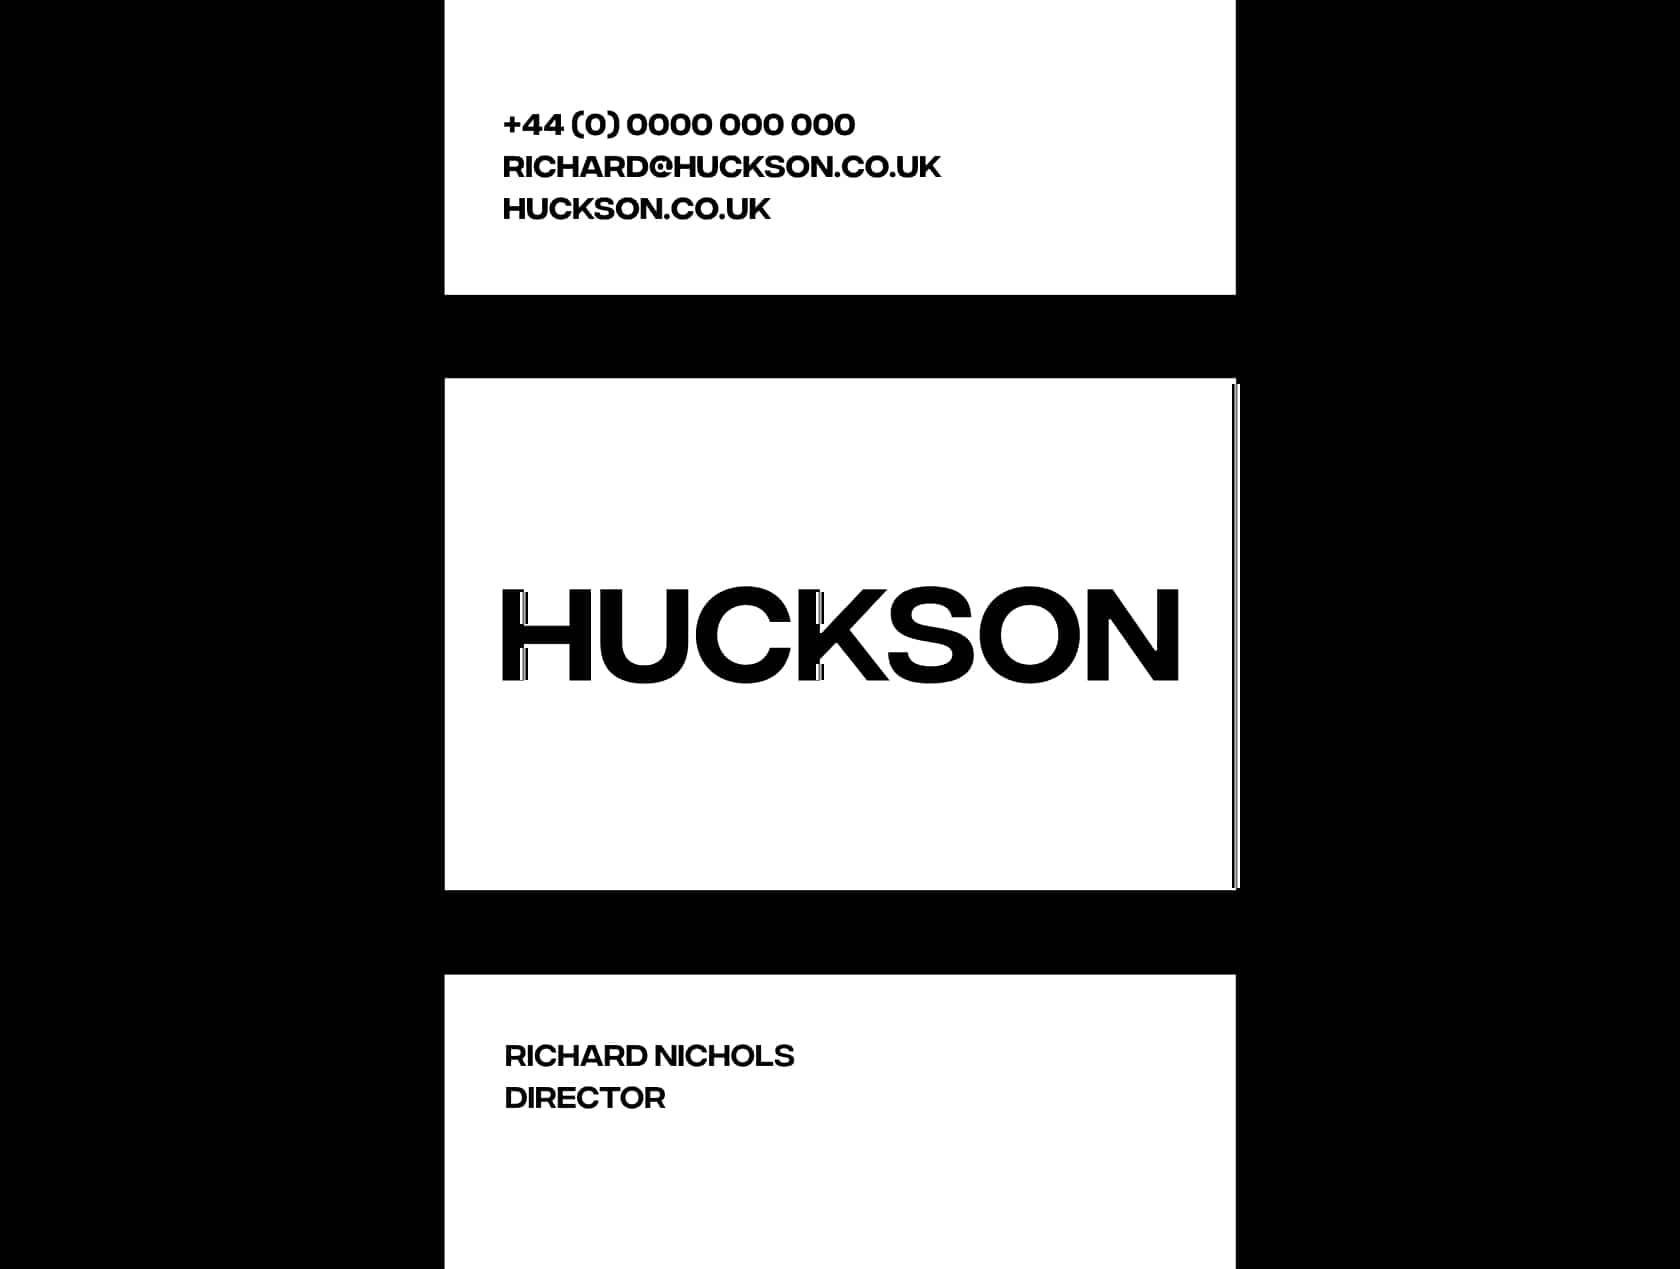 Huckson stationary